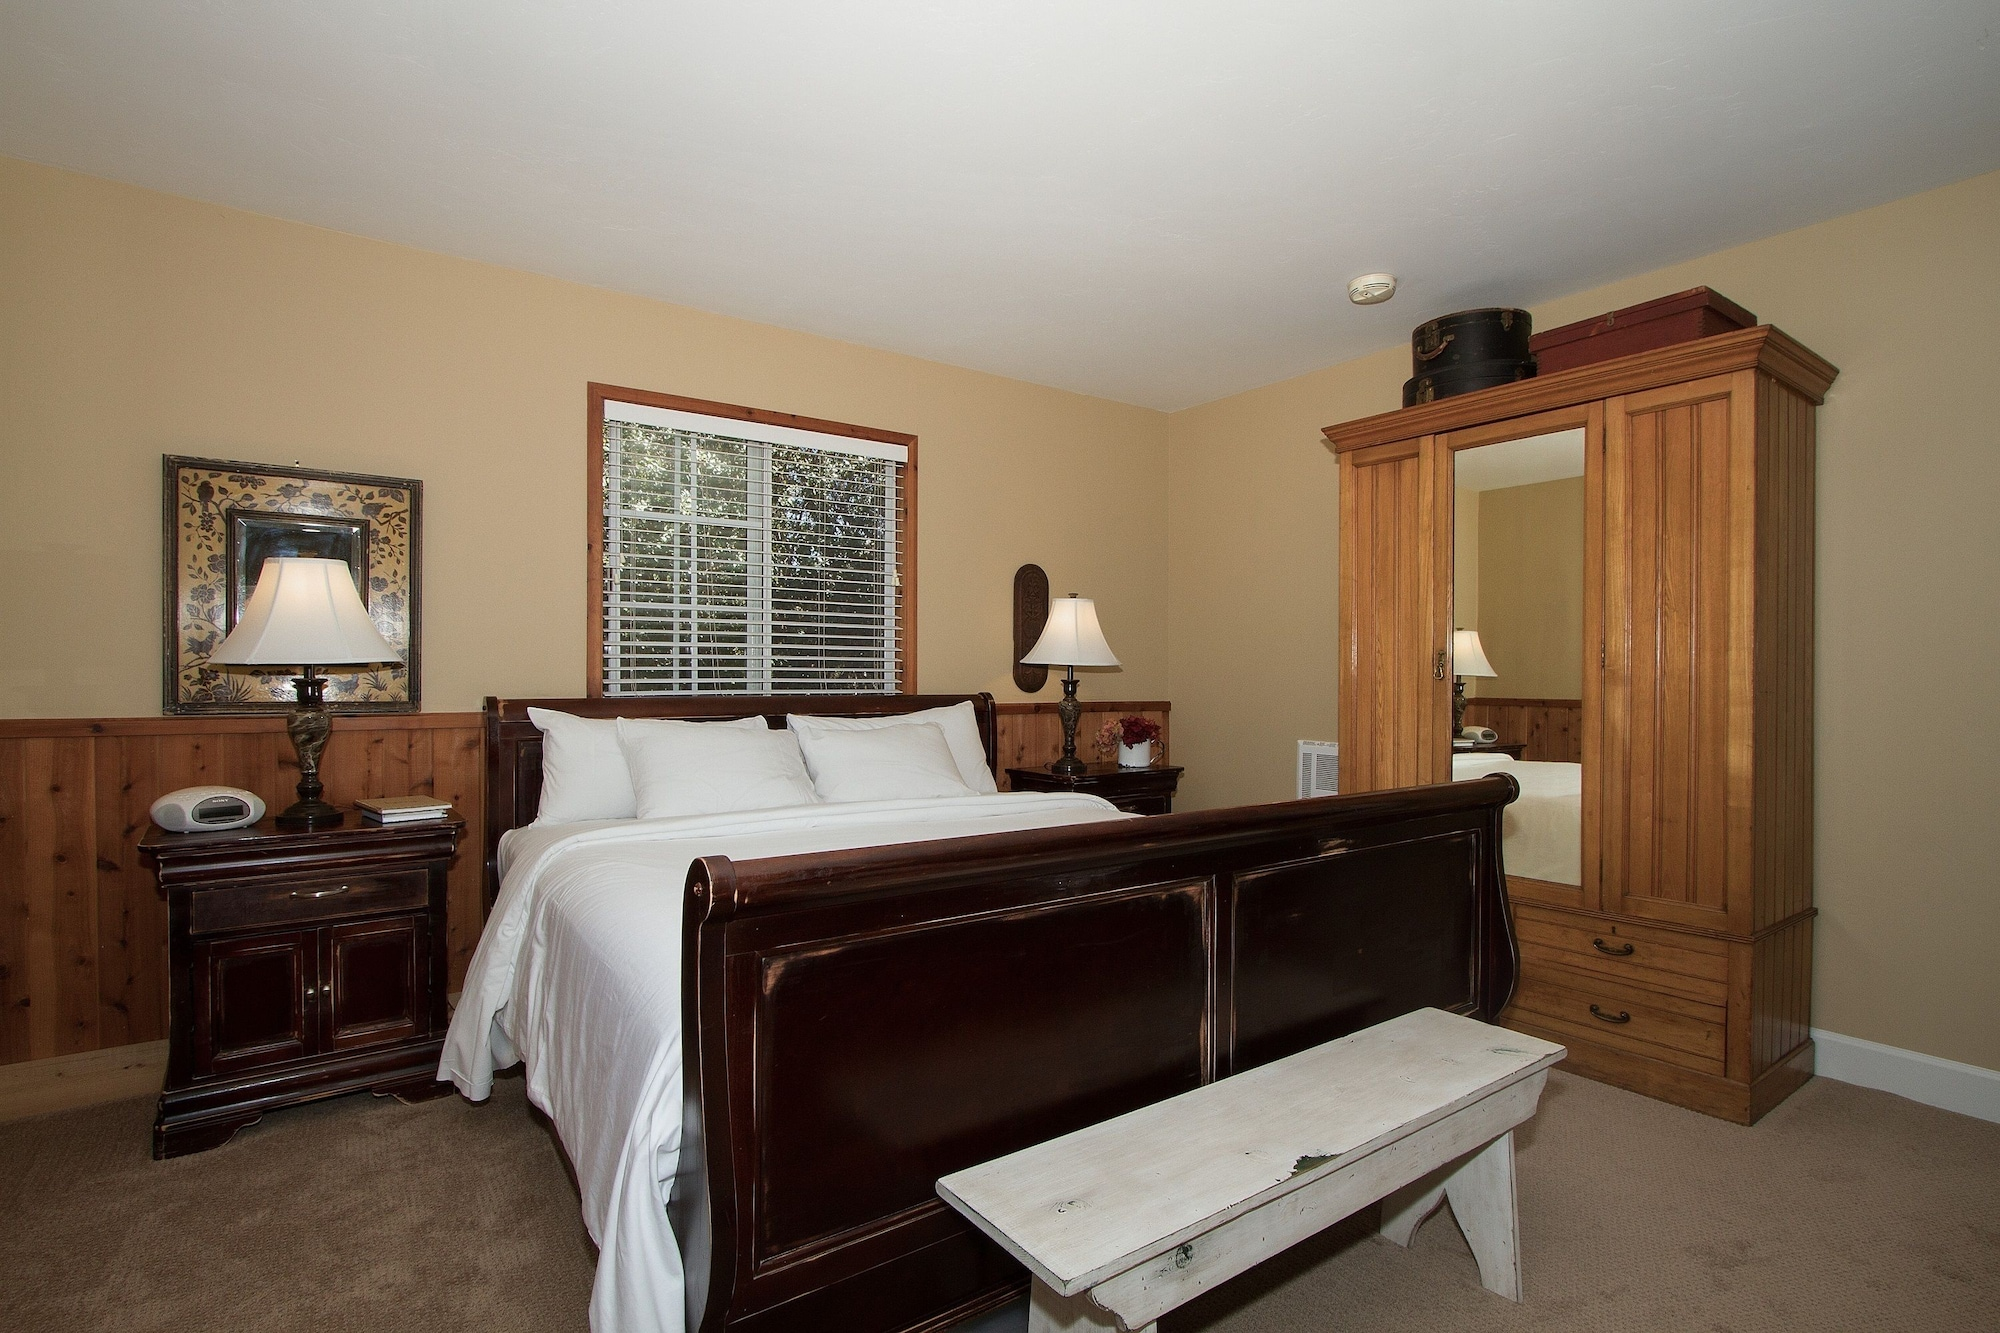 J Patrick House Bed and Breakfast Inn, San Luis Obispo